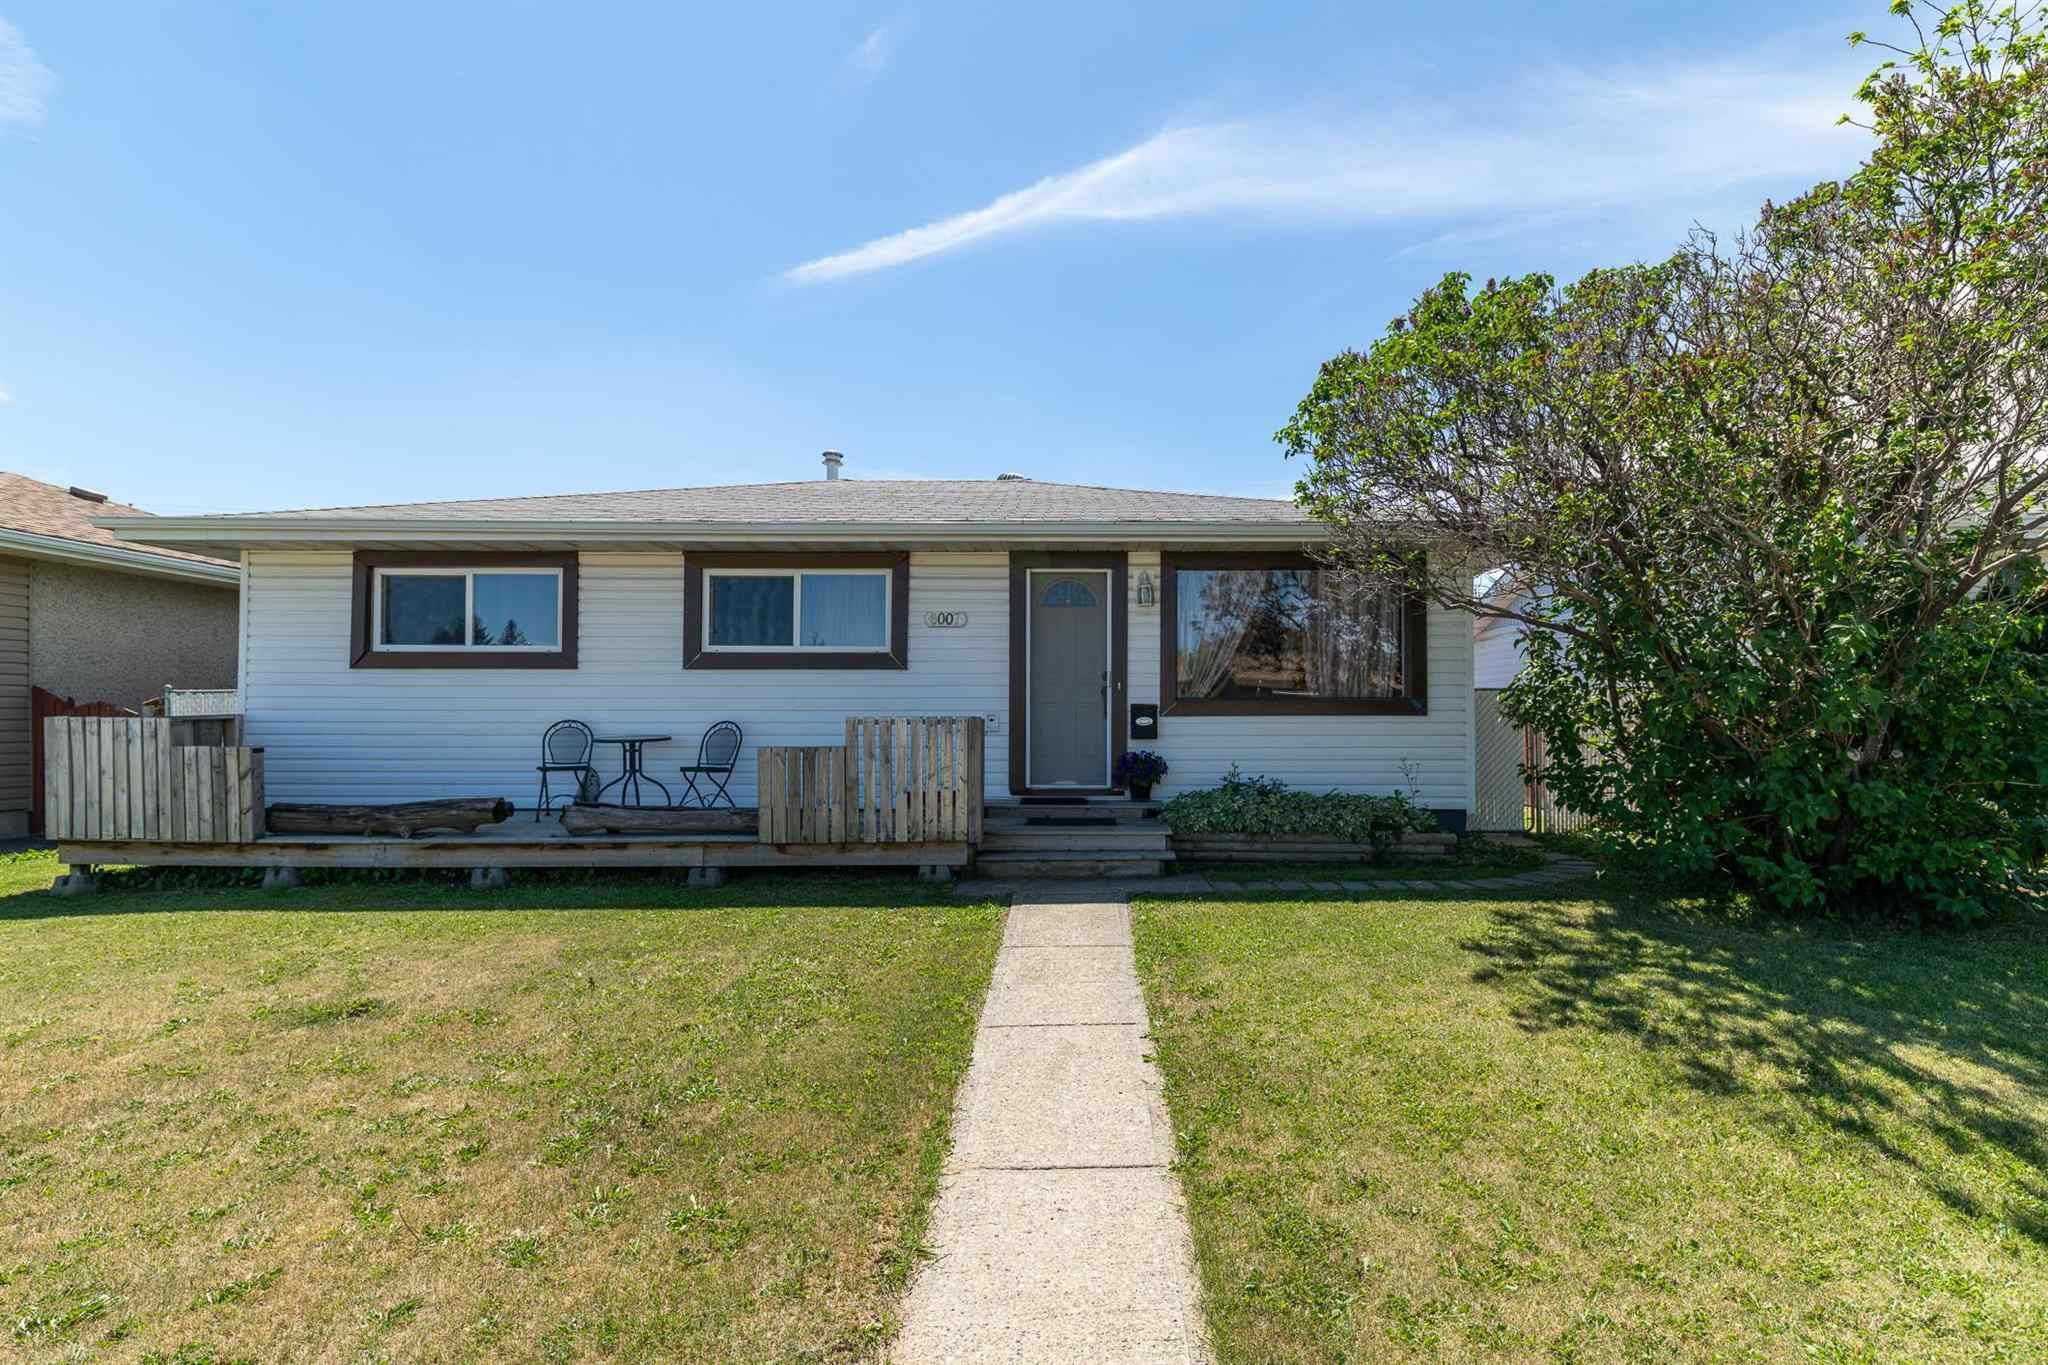 Main Photo: 8007 130 Avenue in Edmonton: Zone 02 House for sale : MLS®# E4252021